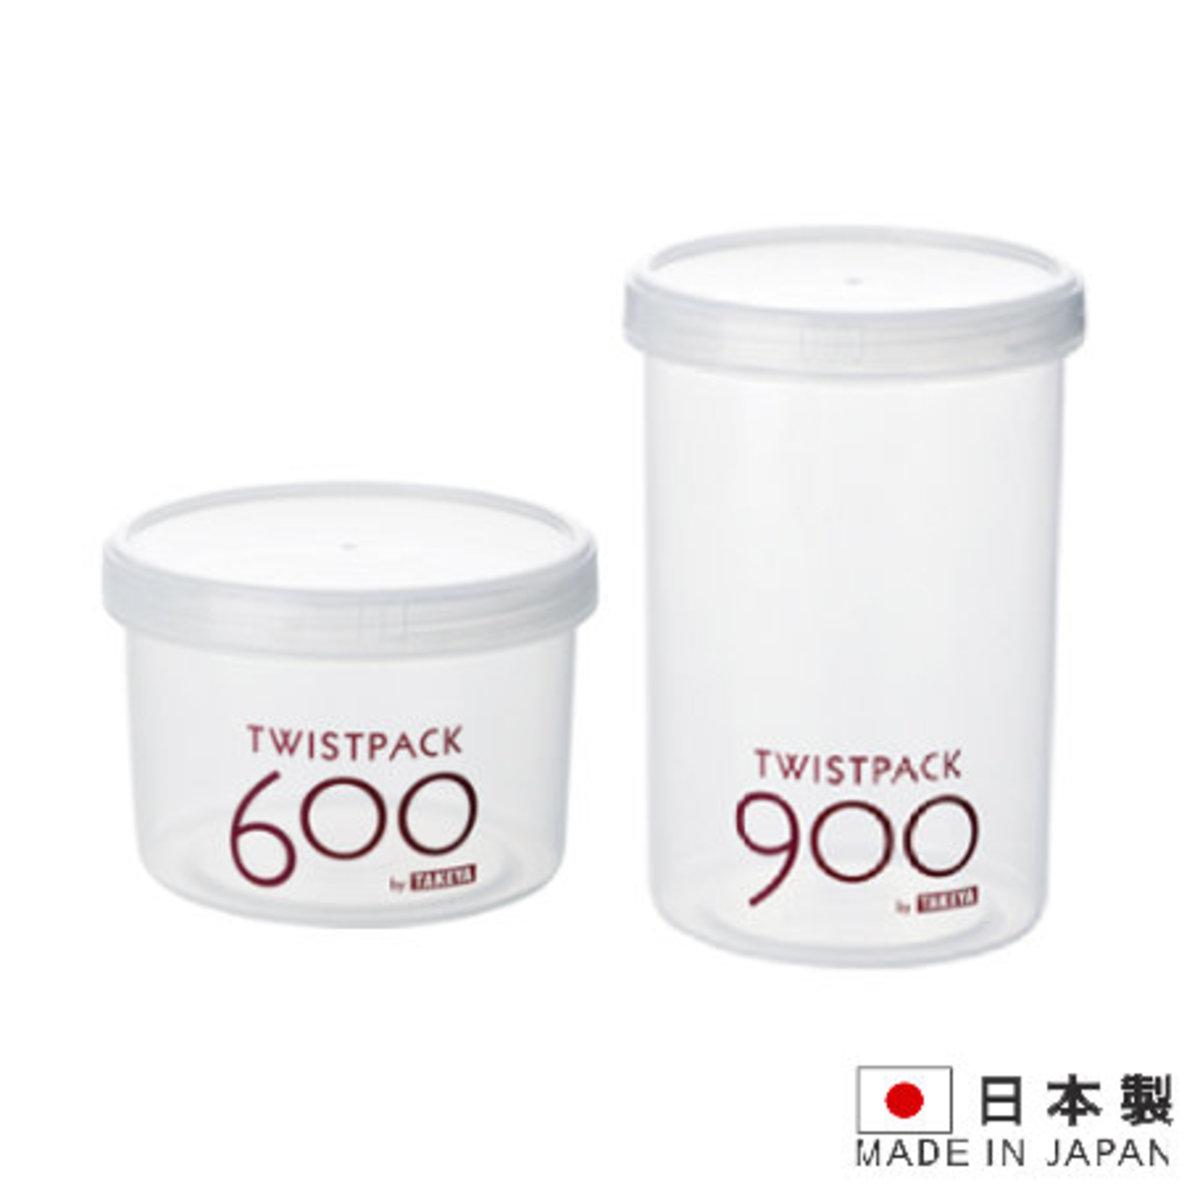 900 Twist Pack 透明密封膠盒_多種容量可選[日本制]